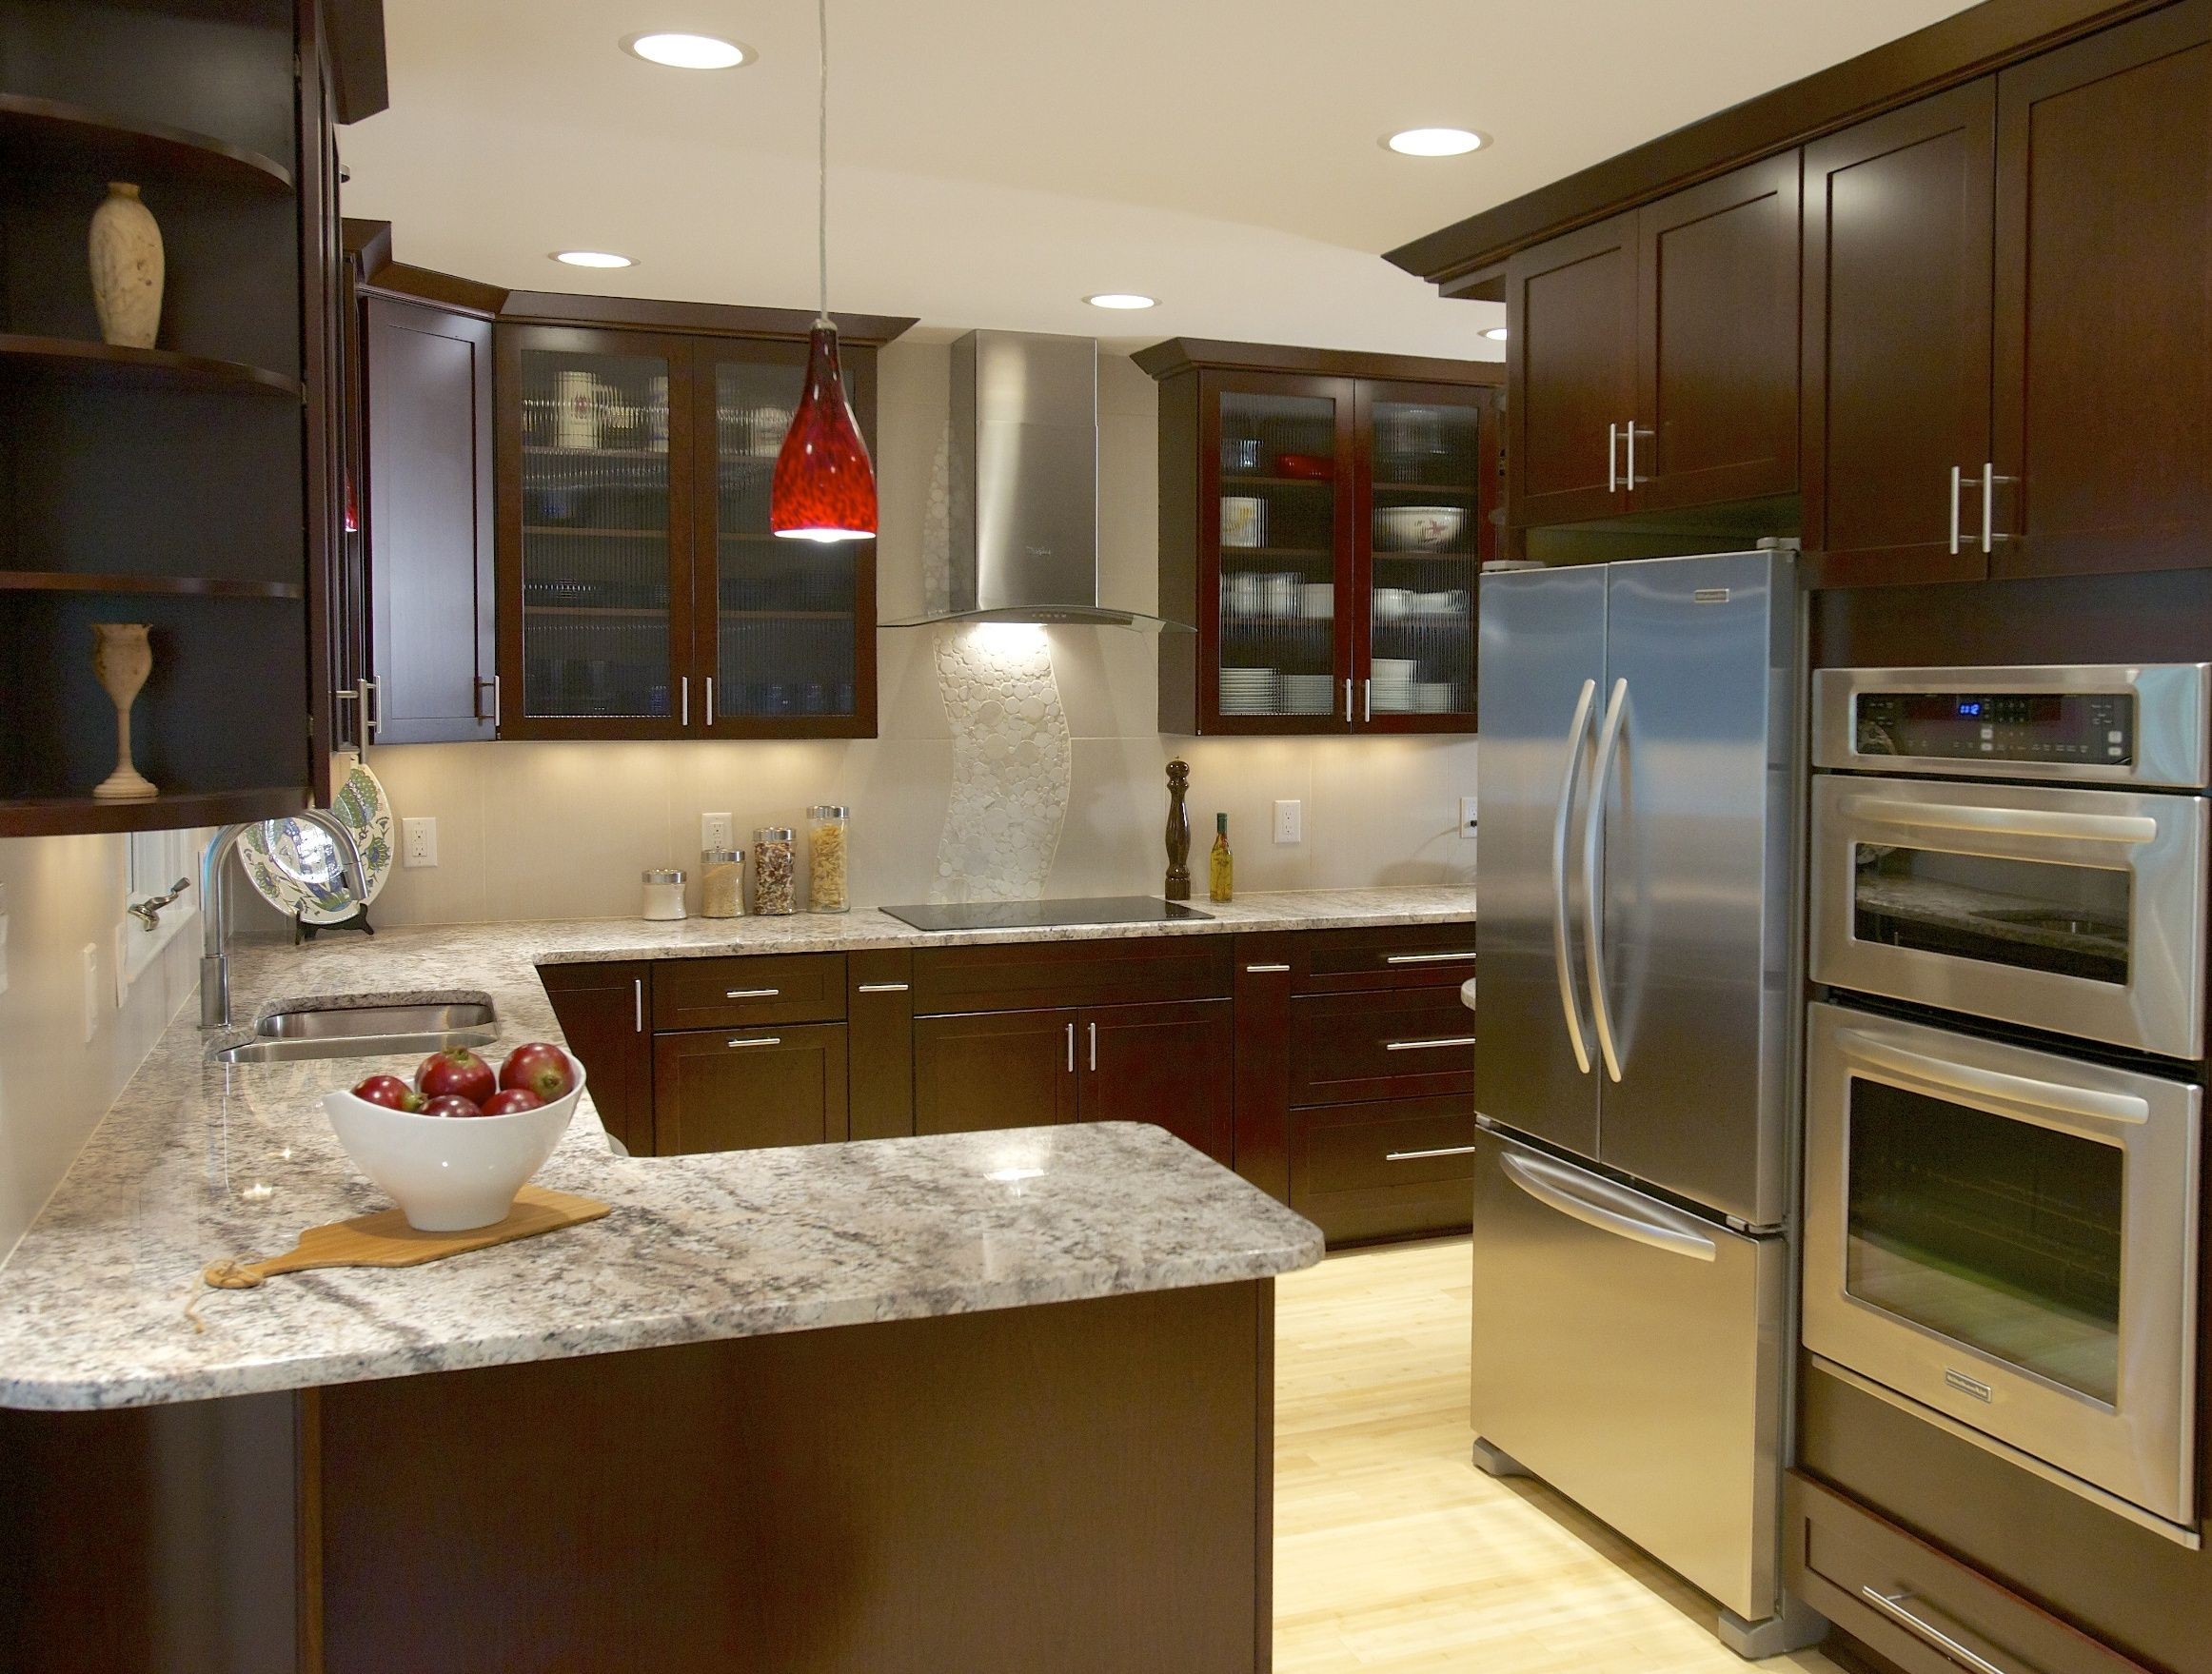 Appealing Bianco Antico Granite For Remodelling Your Interior Home Design:  Beautiful Transformation Bianco Antico Granite